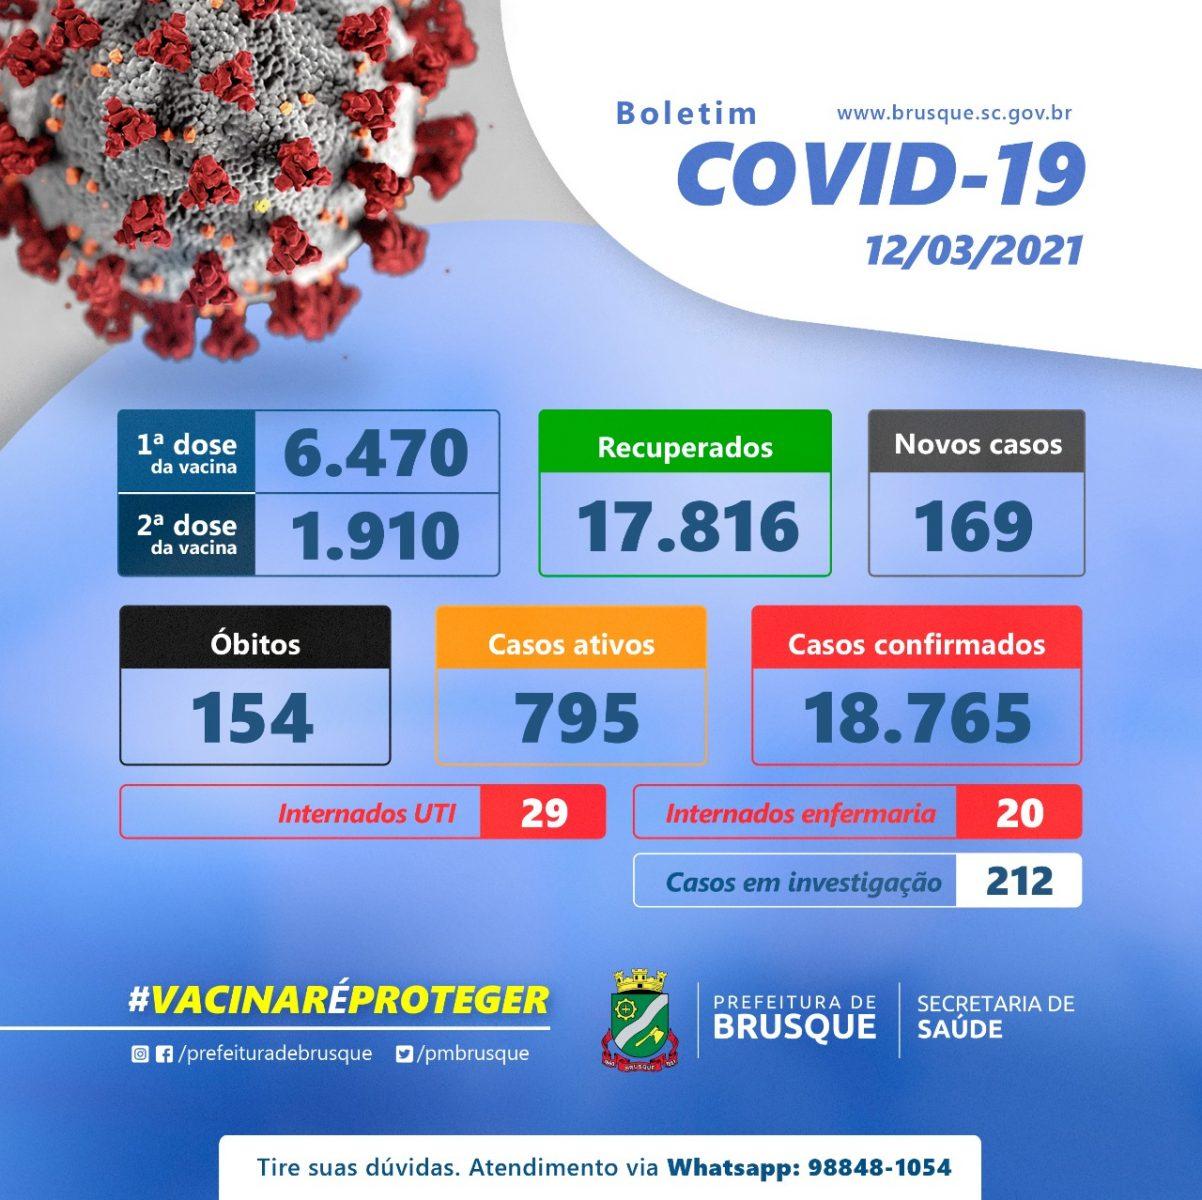 Covid-19: Confira o boletim epidemiológico desta sexta-feira (12)